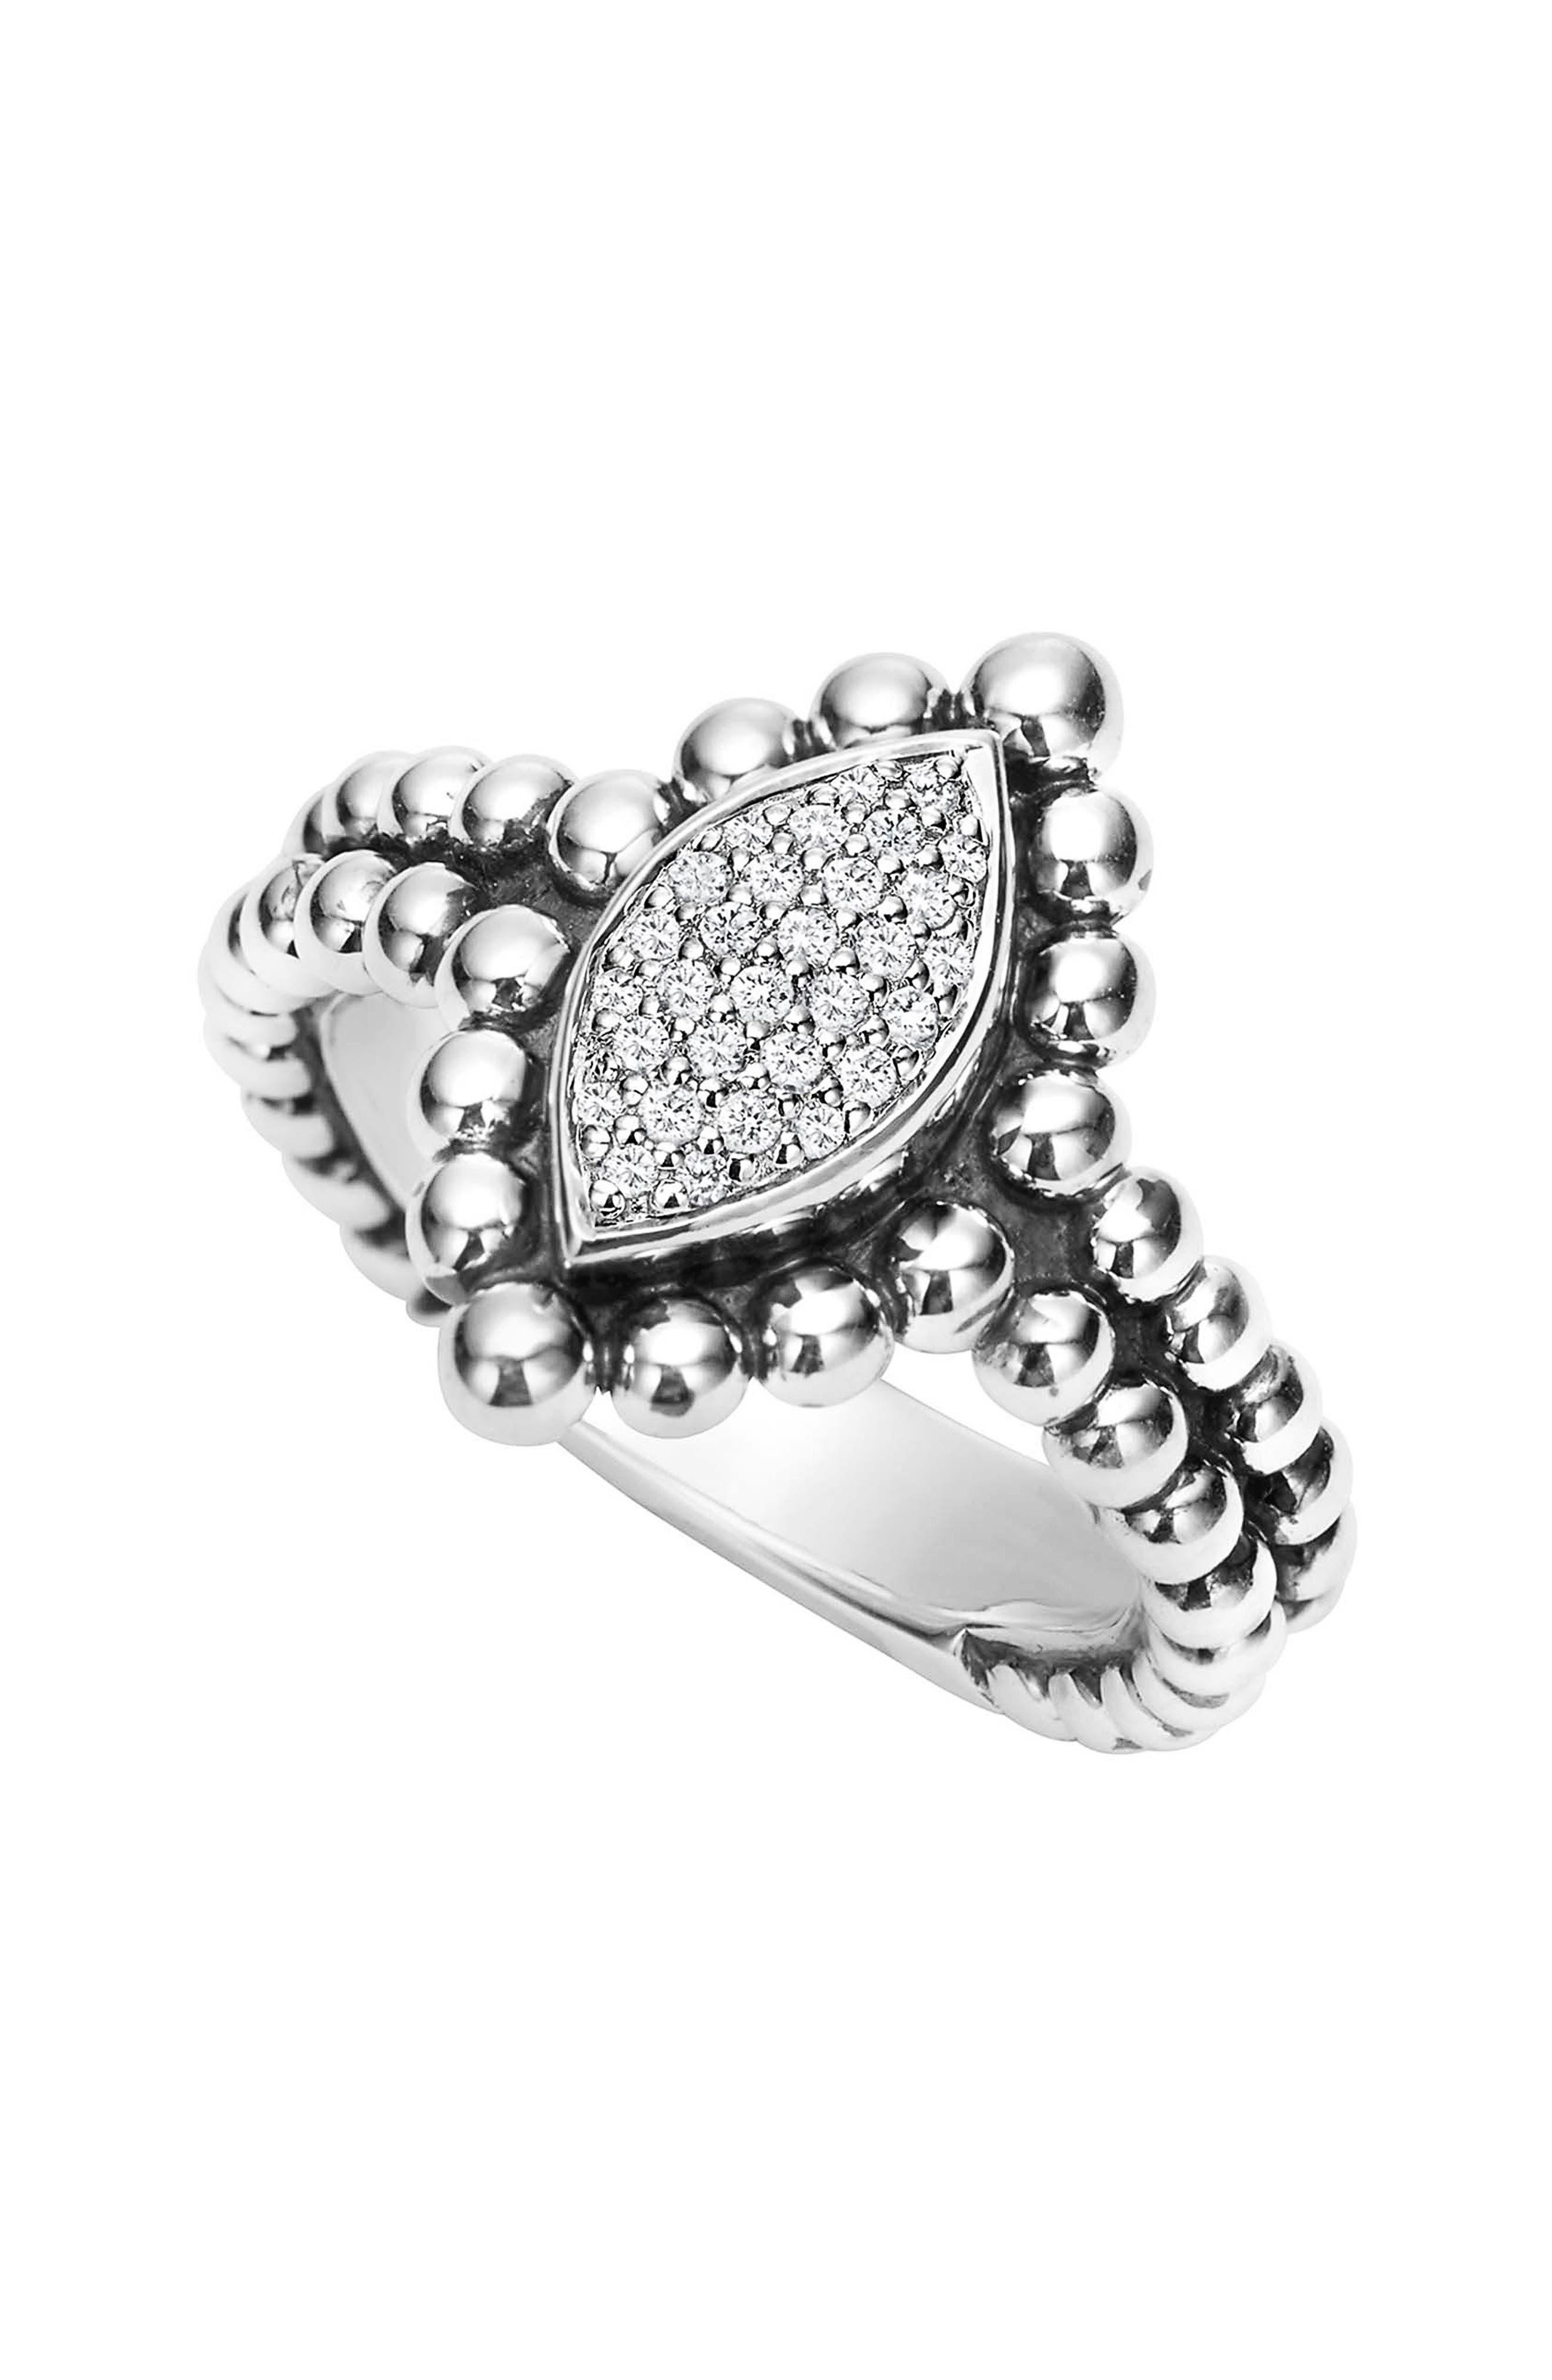 Caviar Spark Diamond Marquise Ring,                             Main thumbnail 1, color,                             SILVER/ DIAMOND